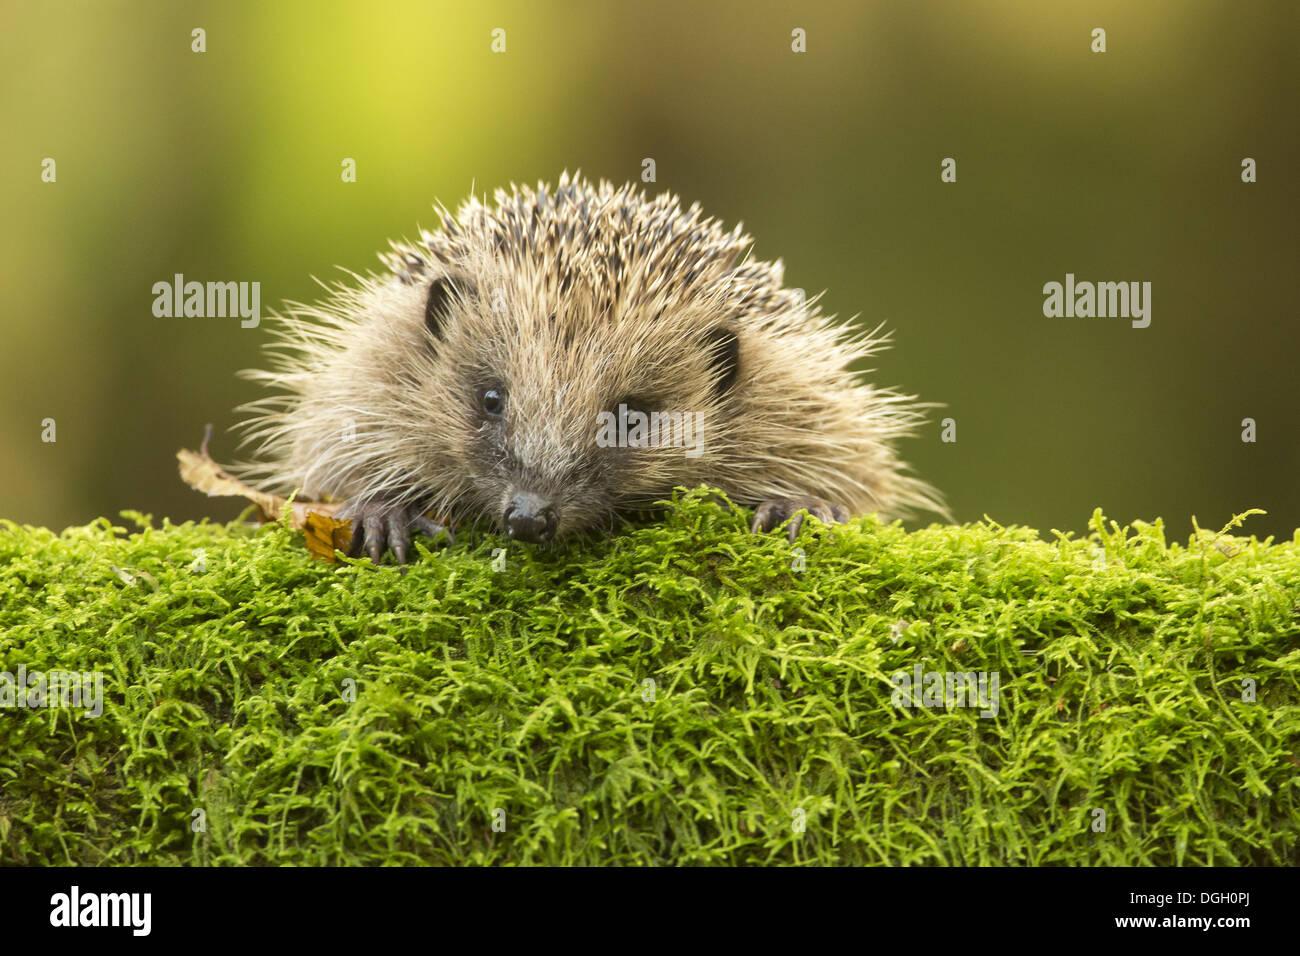 European Hedgehog (Erinaceus europaeus) adult, looking over moss, Sussex, England, November Stock Photo